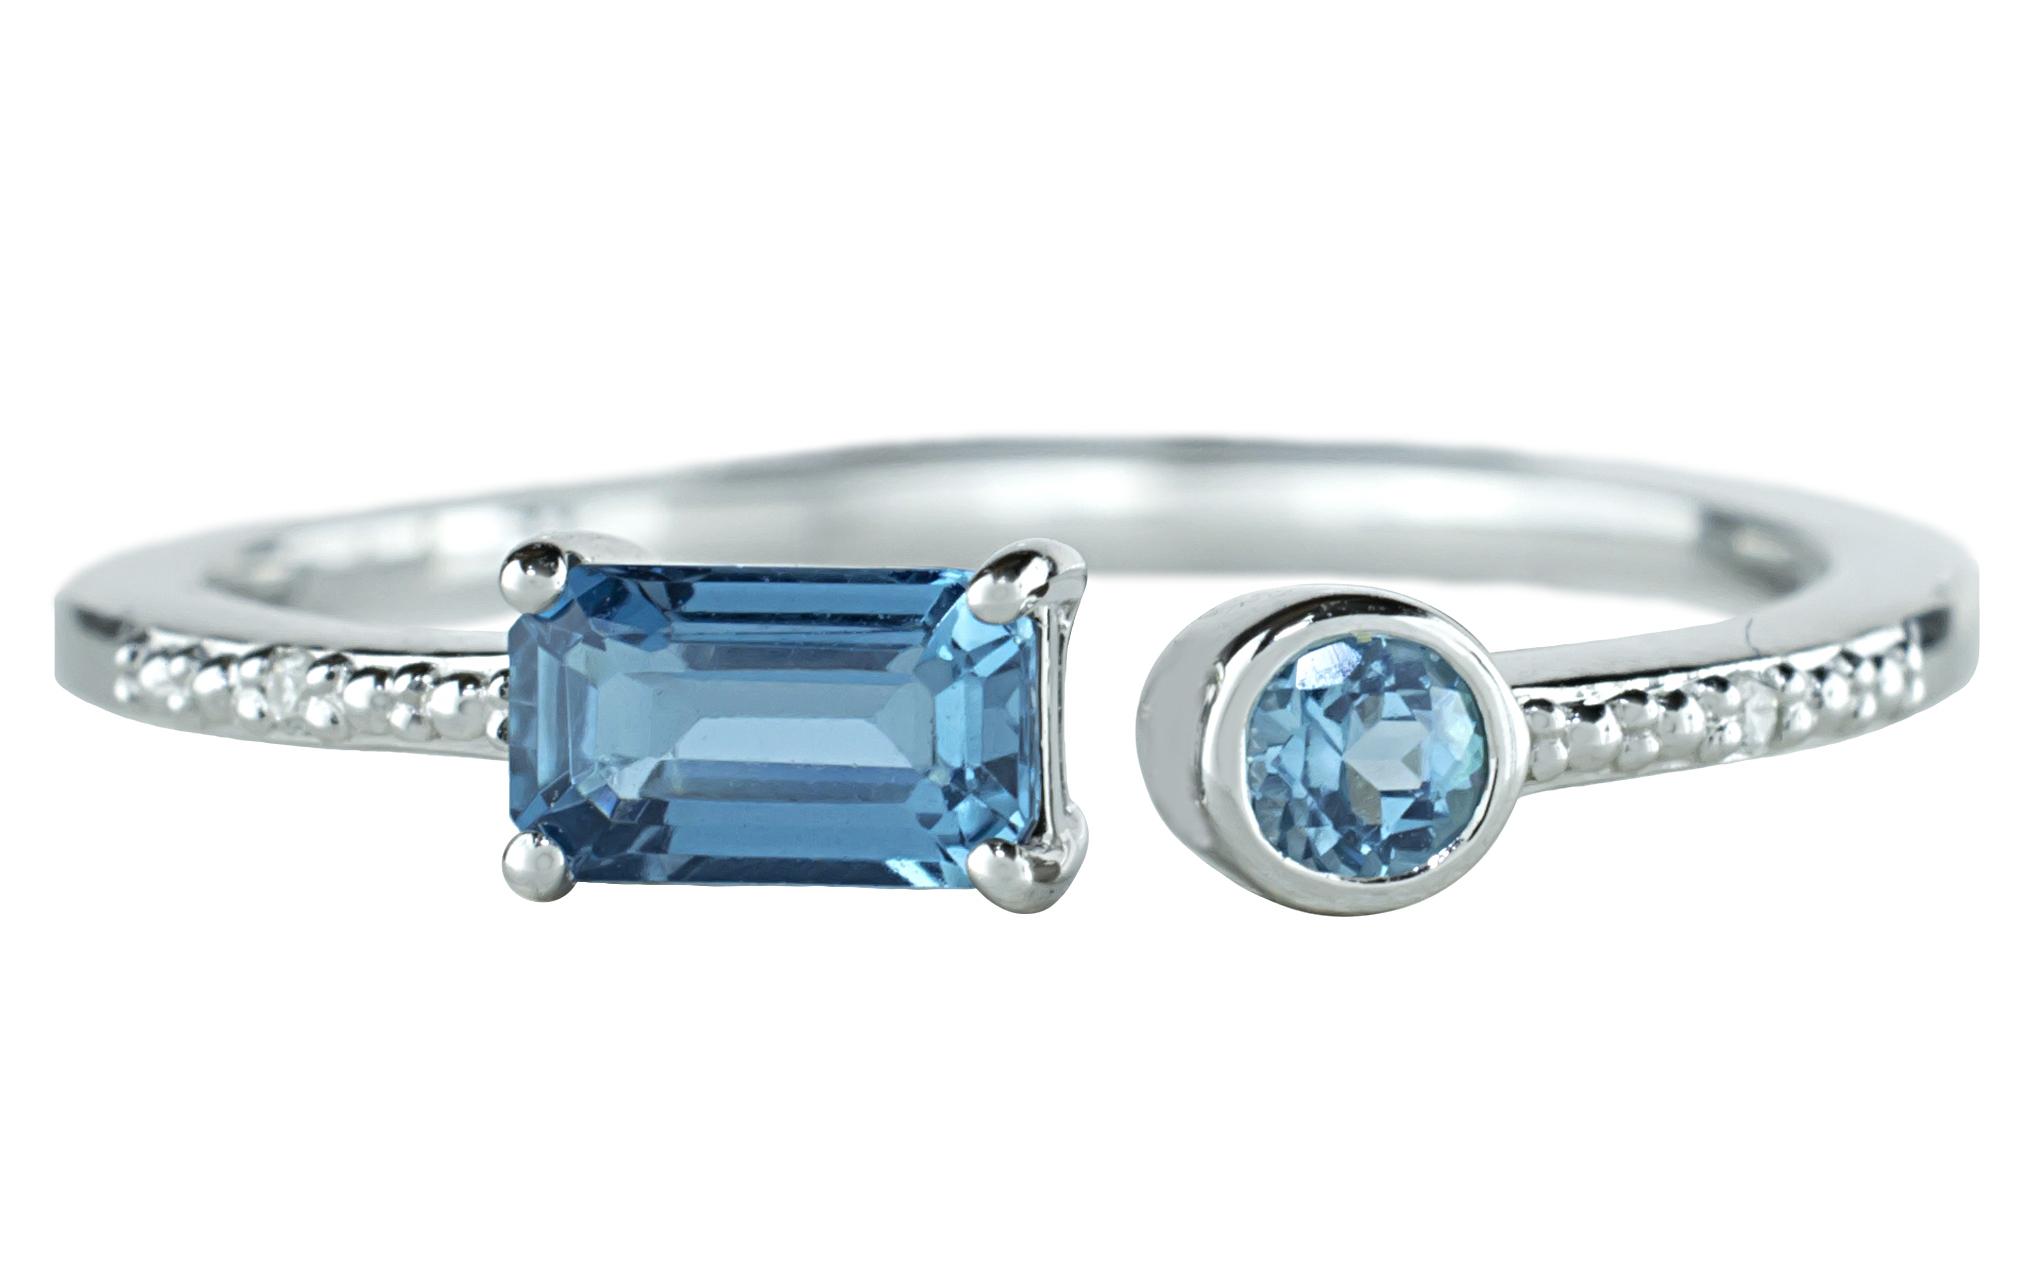 JewelMak London blue topaz ring   JCK On Your Market